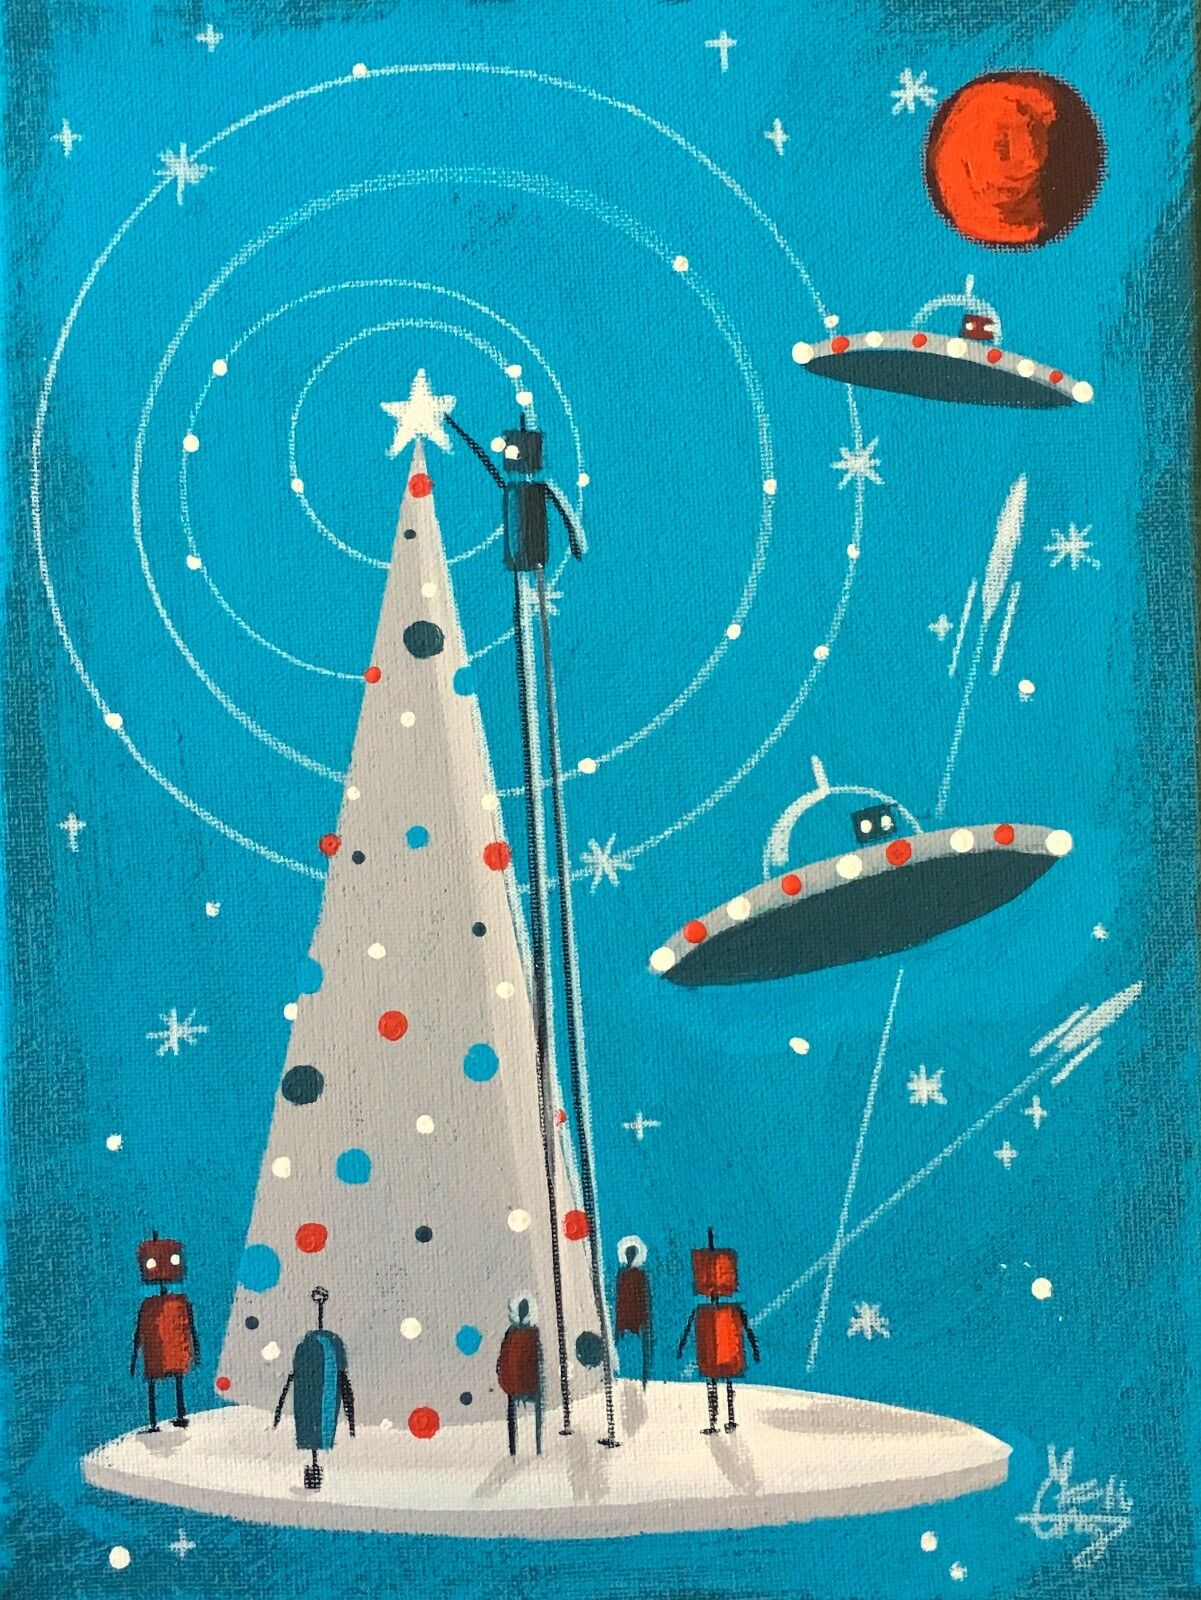 EL GATO GOMEZ RETRO VINTAGE CHRISTMAS HOLIDAY MID CENTURY OUTER SPACE ROBOT 50'S